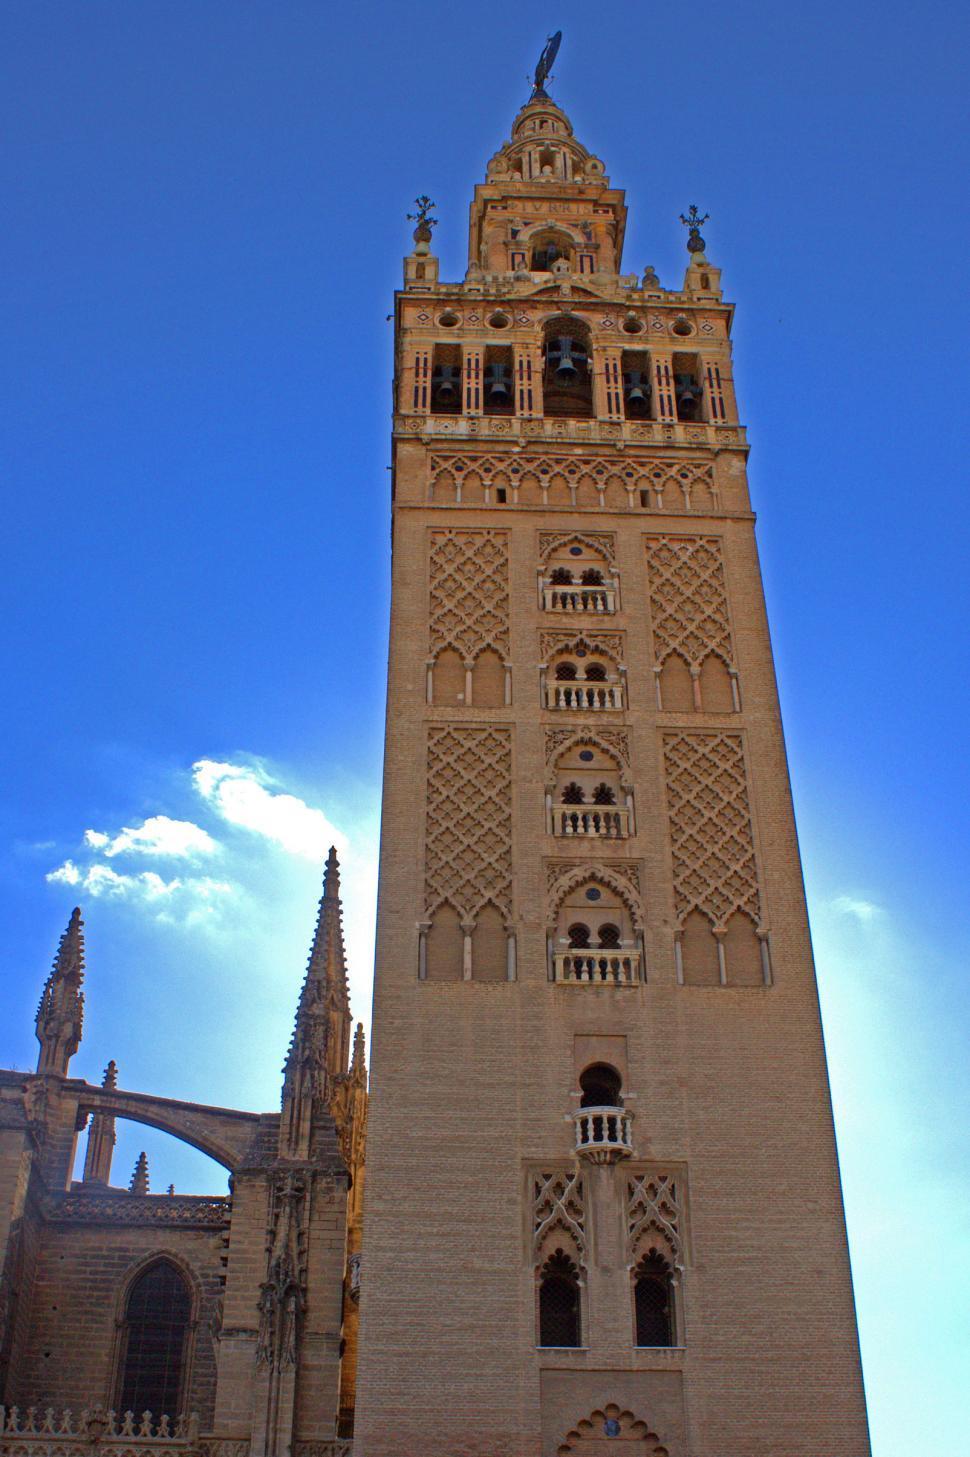 Download Free Stock Photo of La Giralda tower in Seville, Spain